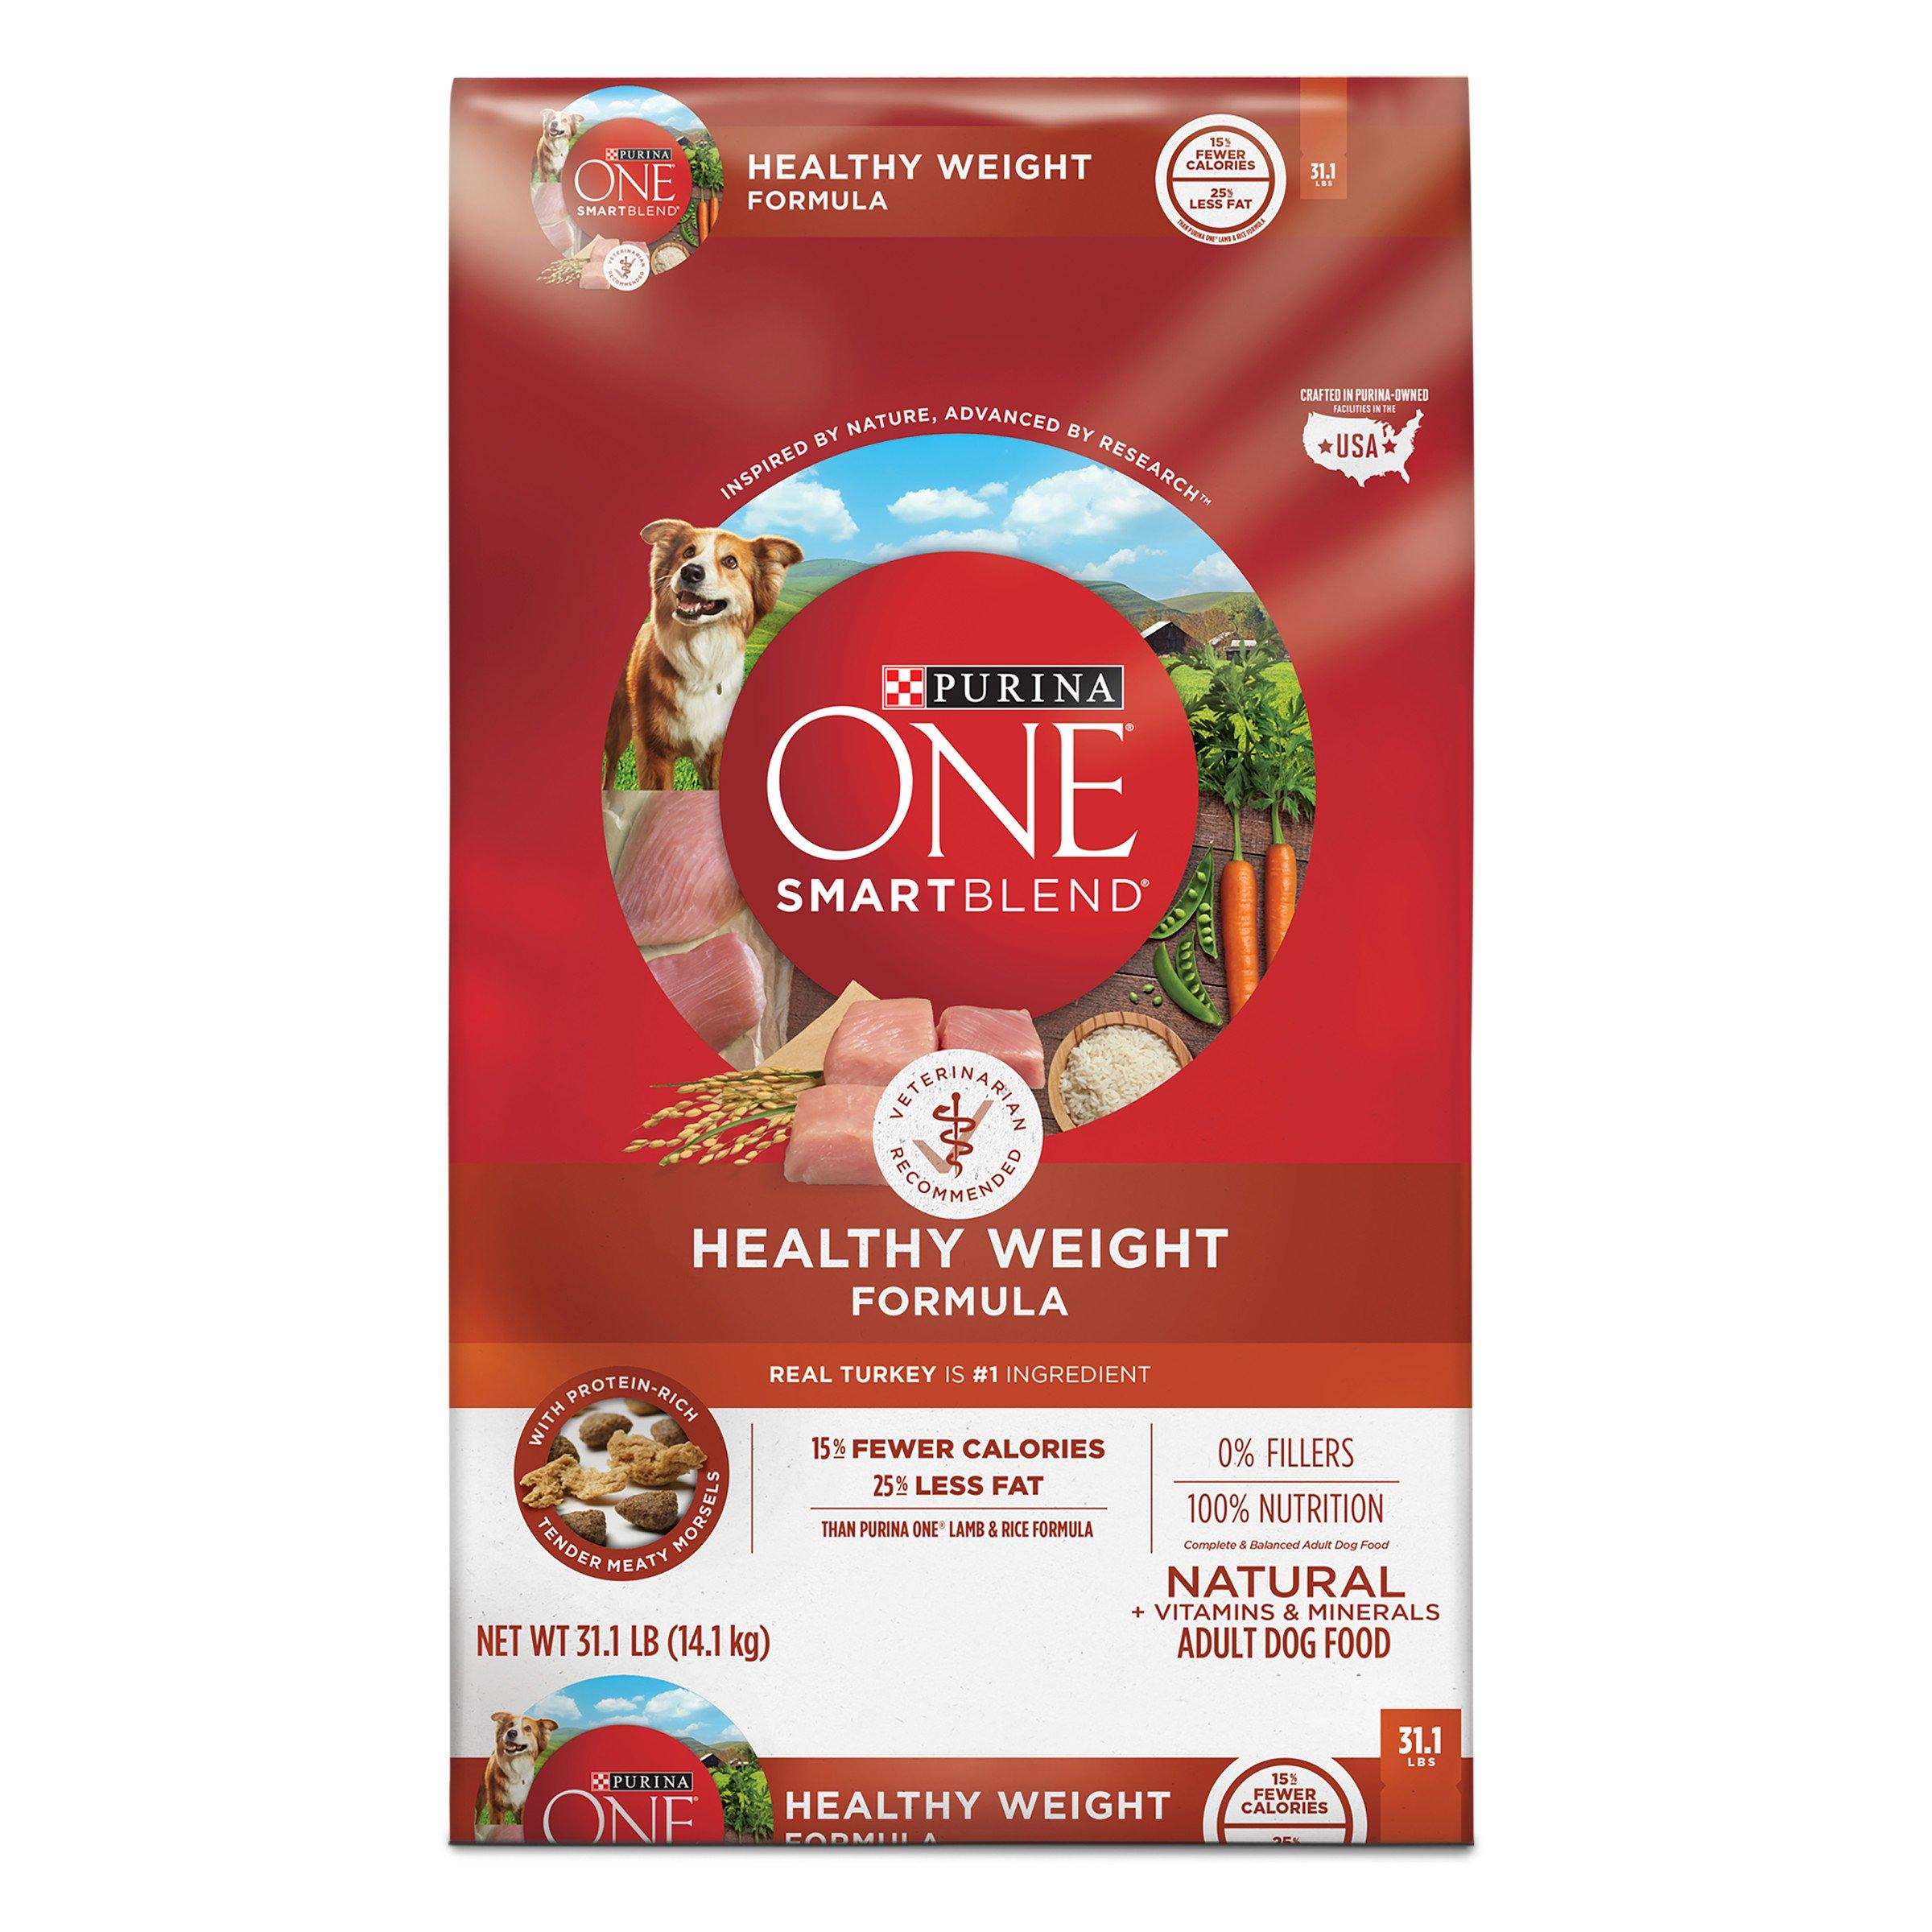 Purina ONE SmartBlend Natural Healthy Weight Formula Adult Dry Dog Food - 31.1 lb. Bag